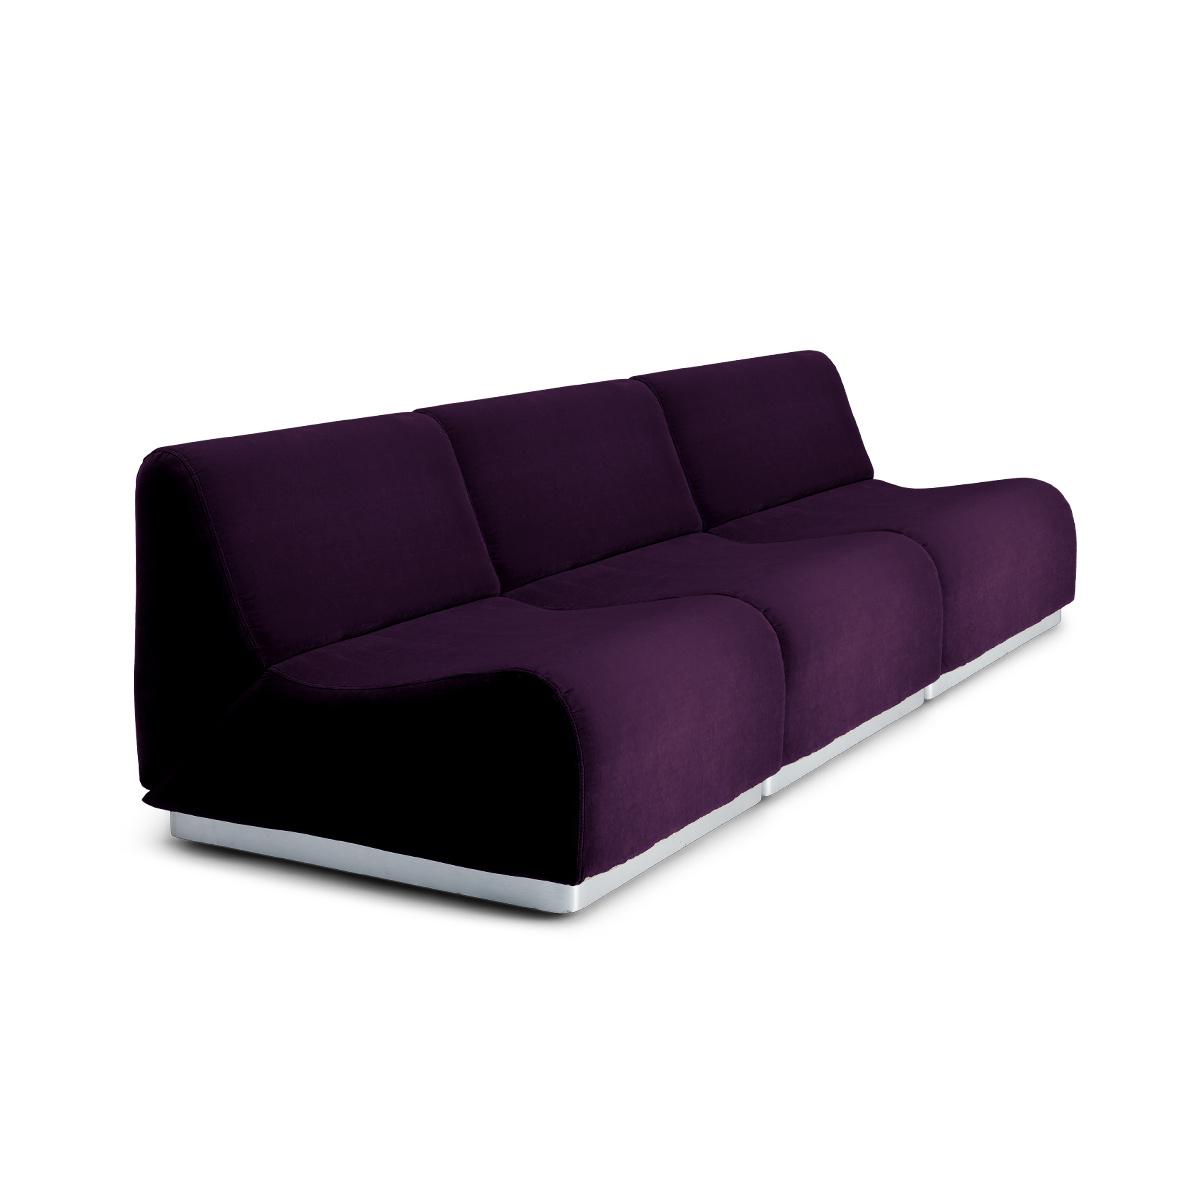 Canapé modulable Rotondo velours prune